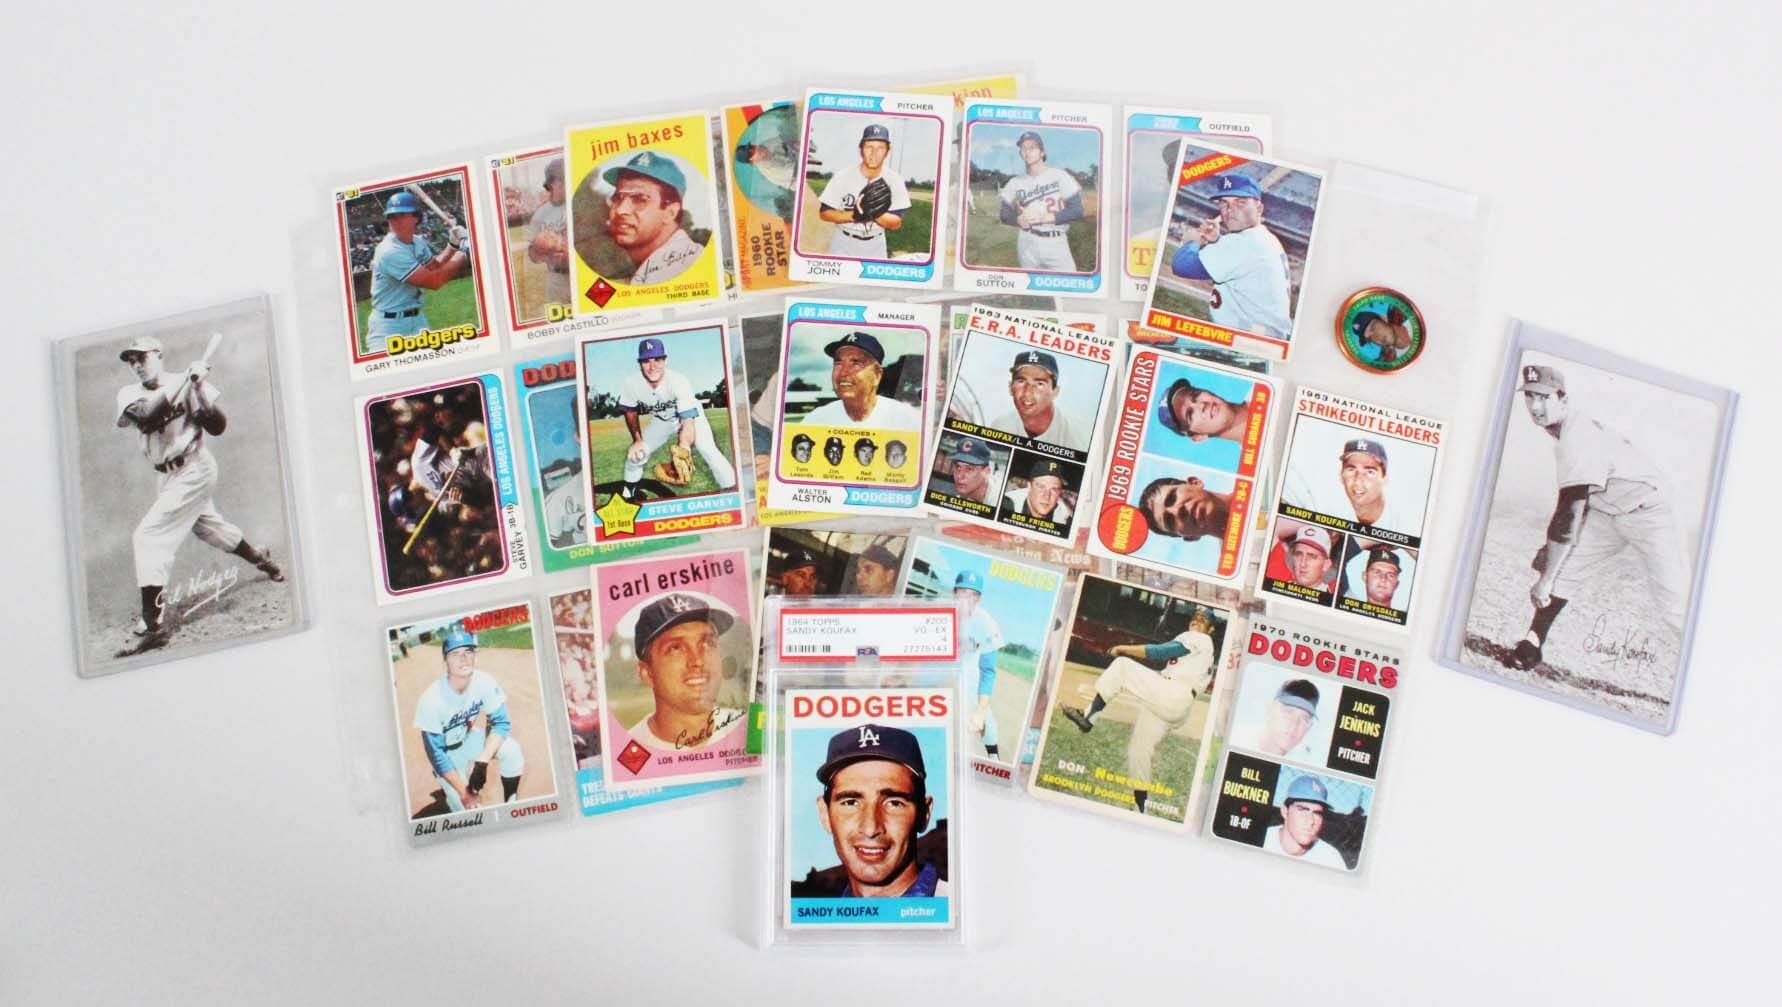 Los Angeles Dodgers Vintage Baseball Card Lot (35) - Sandy Koufax Graded Card, etc.